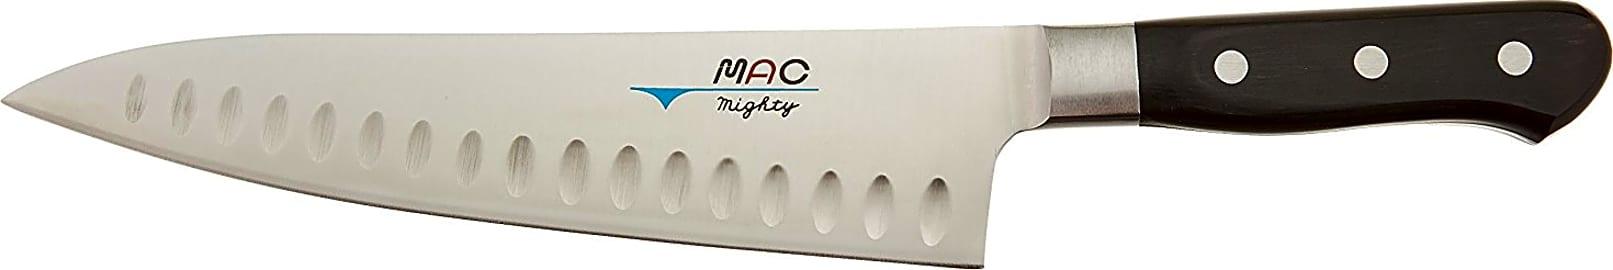 Mac Mighty Professional